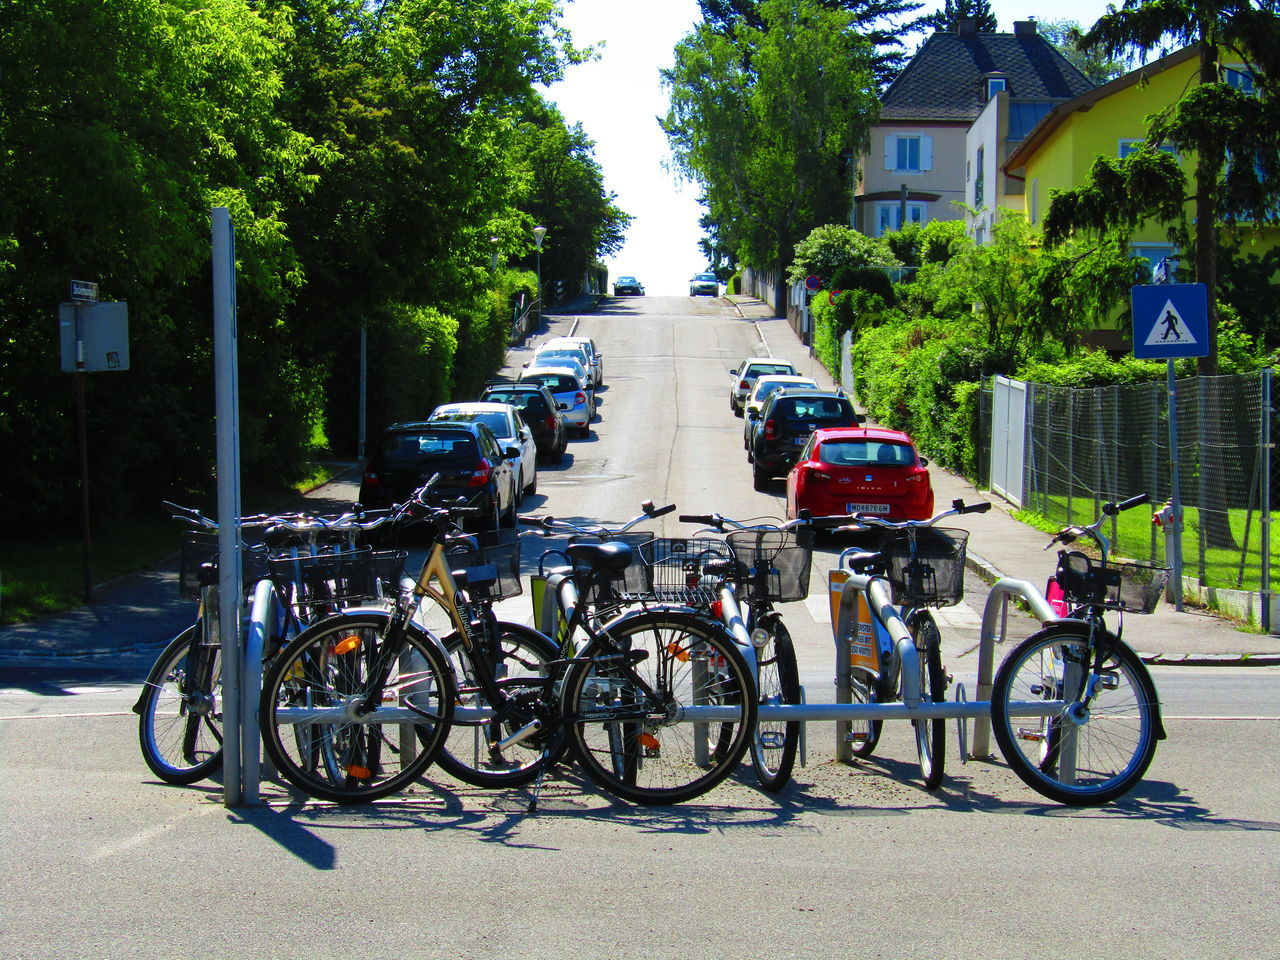 Fahrräder Fahrrad Street Hill Summer Sommer Bicycle RAD Bike Rodaun Wien Vienna Austria